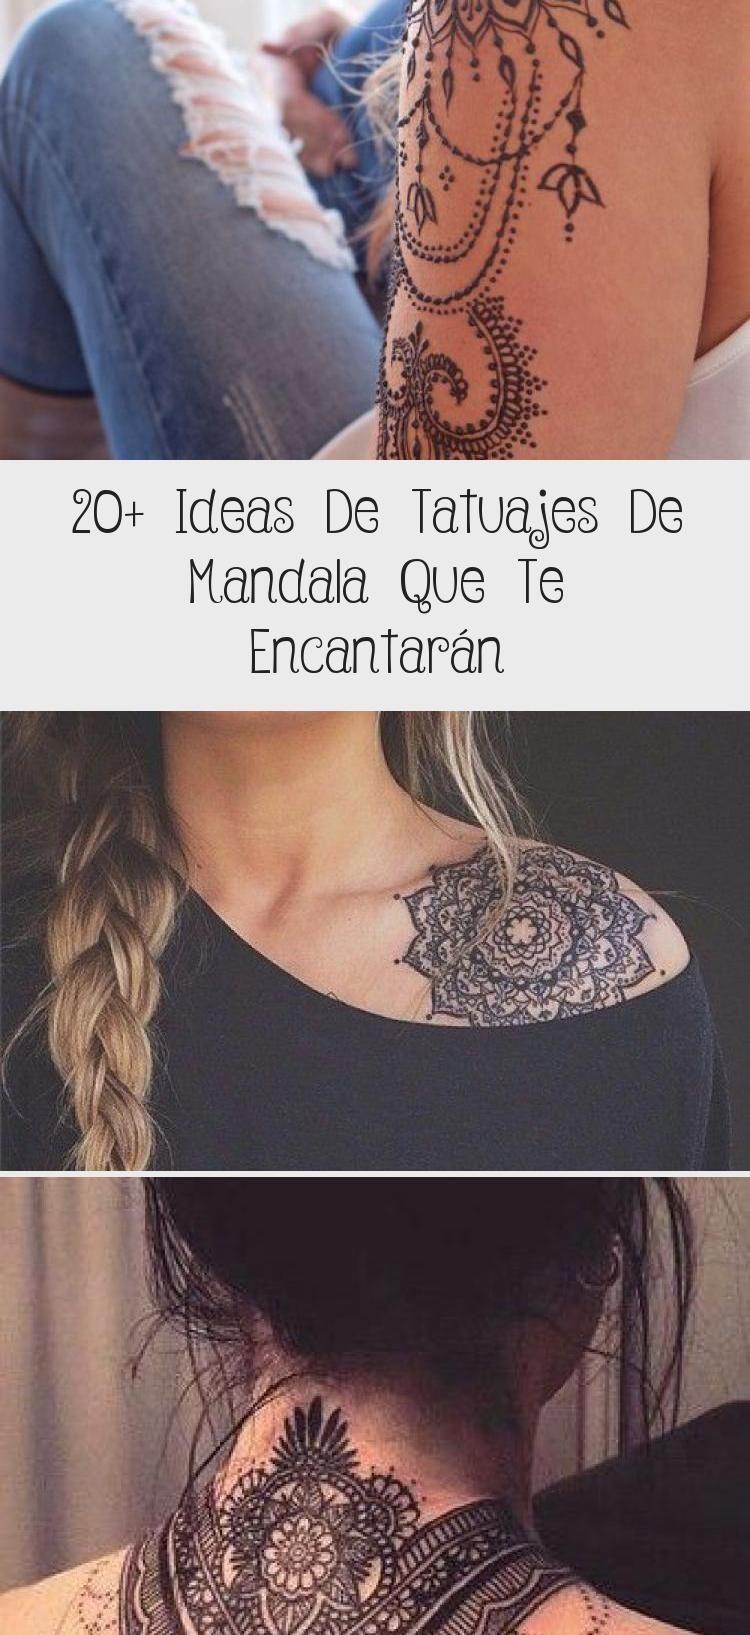 Photo of Mandala Oberschenkel Tattoo für Frauen – 40 komplizierte Mandala Tattoo Designs: #Compassma …